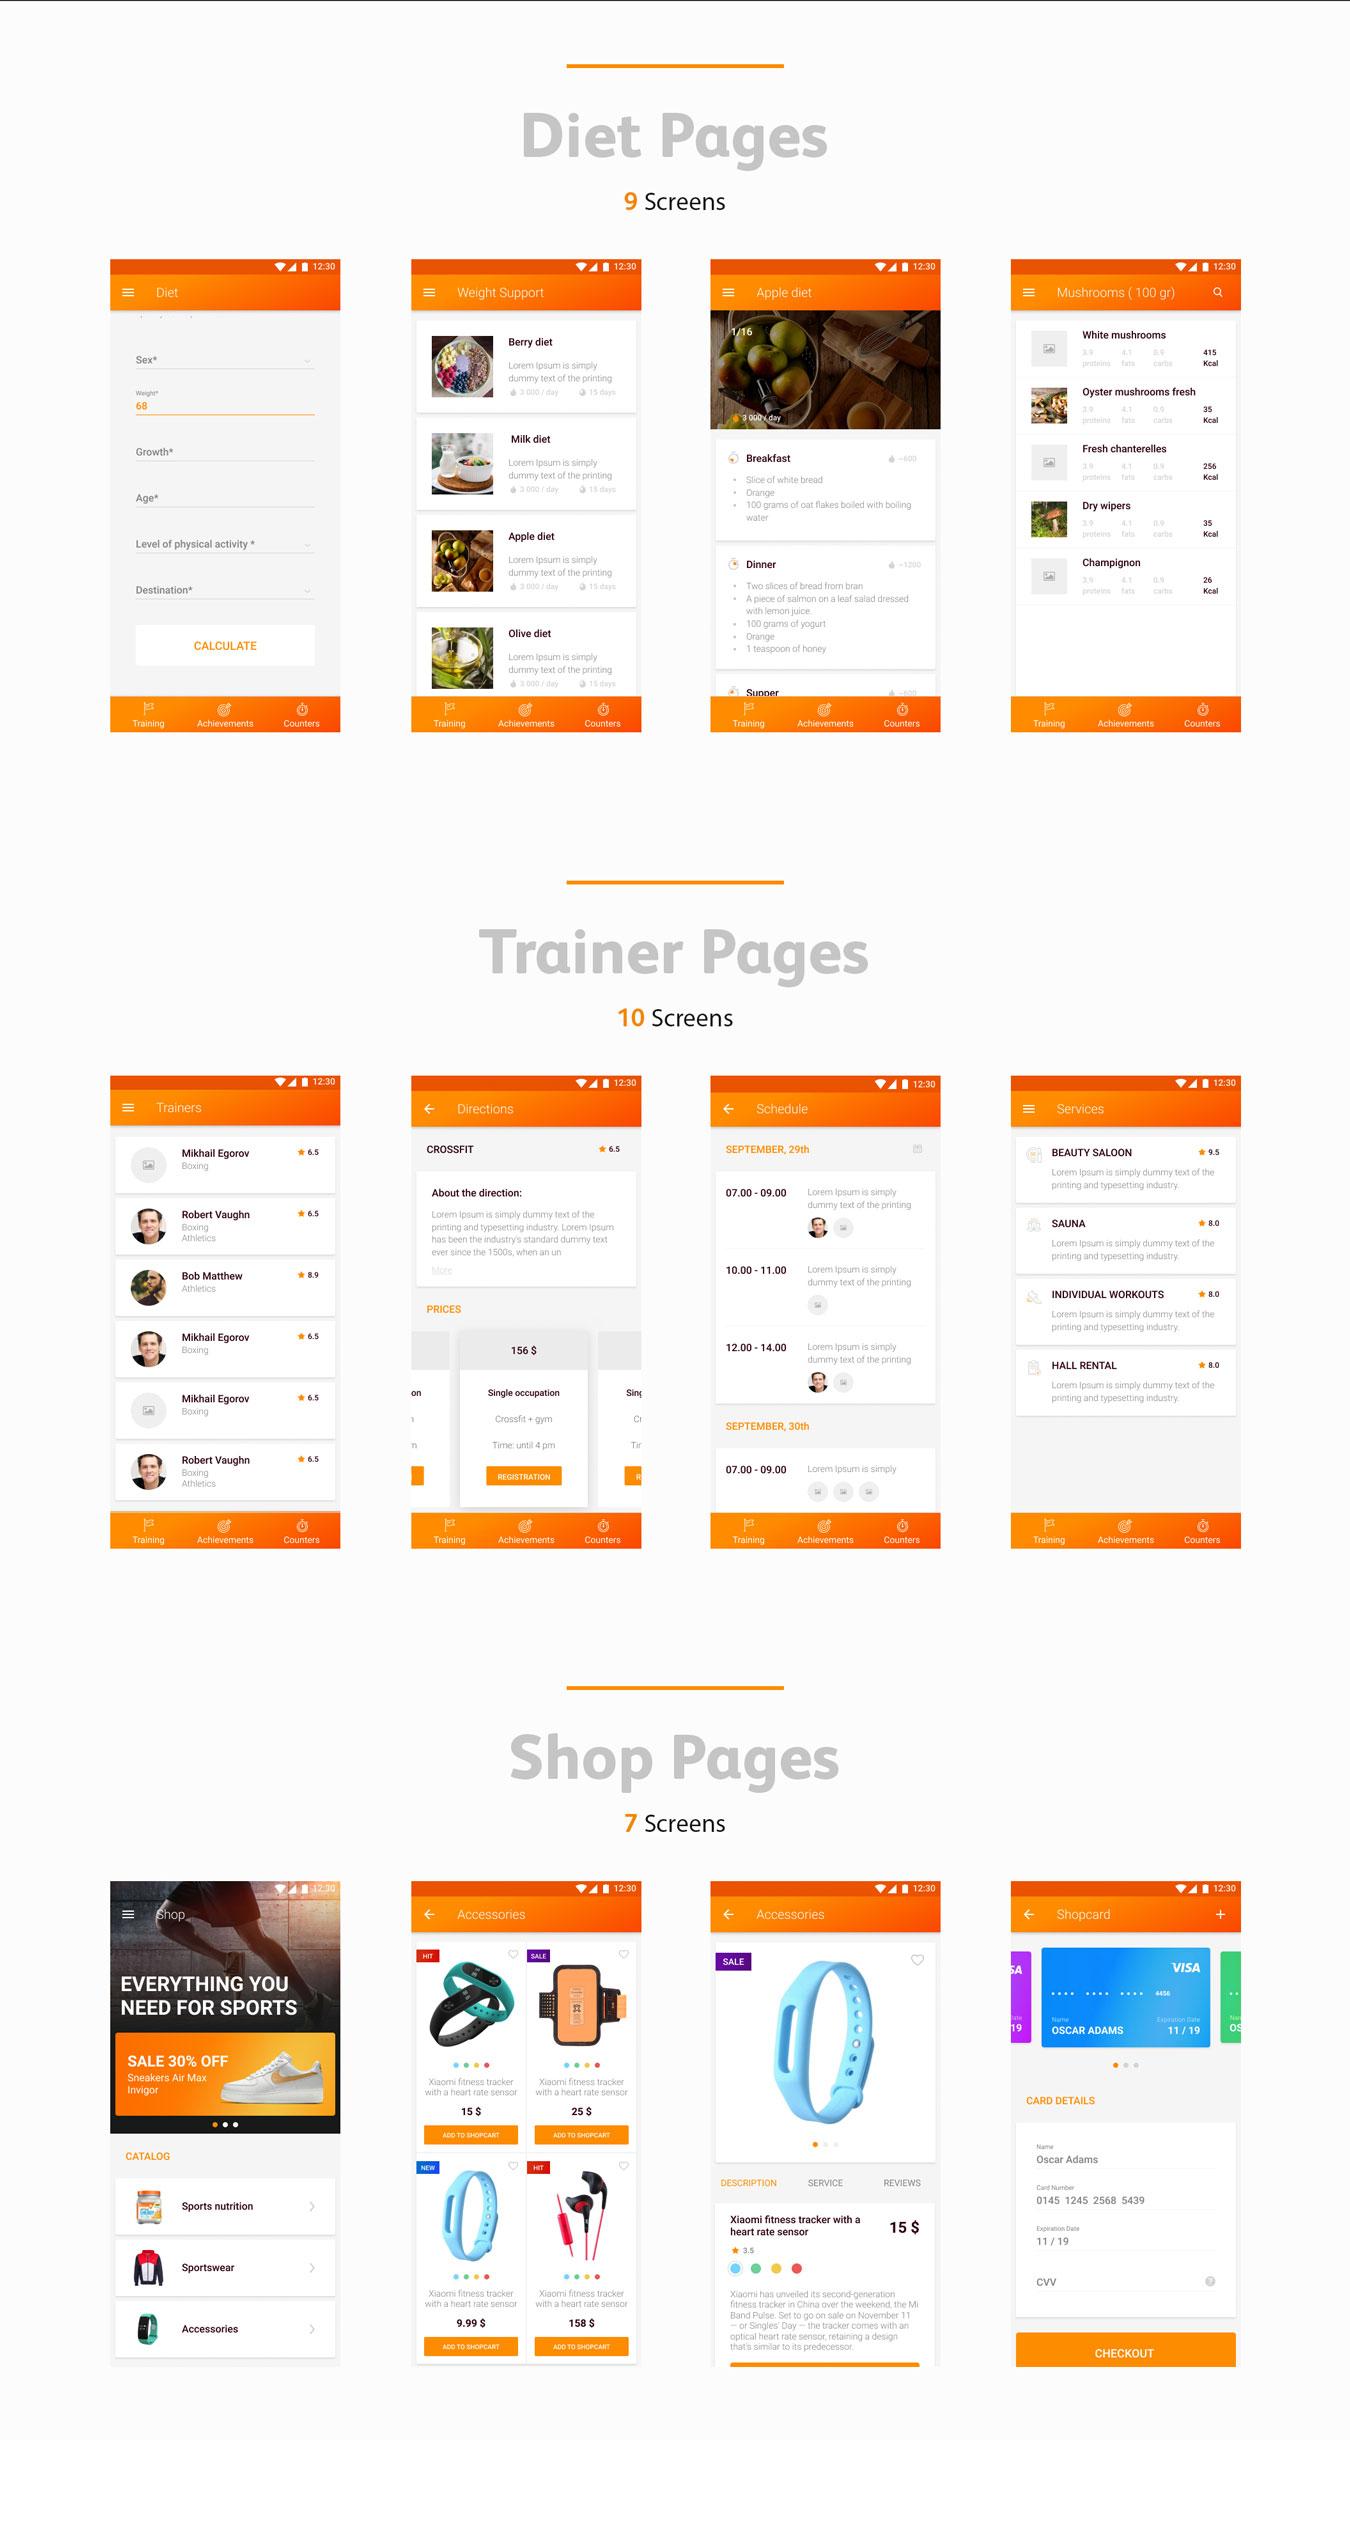 高质量健身旅行商城购物Android UI工具包 FIT BIT Sport UI Kit插图(7)